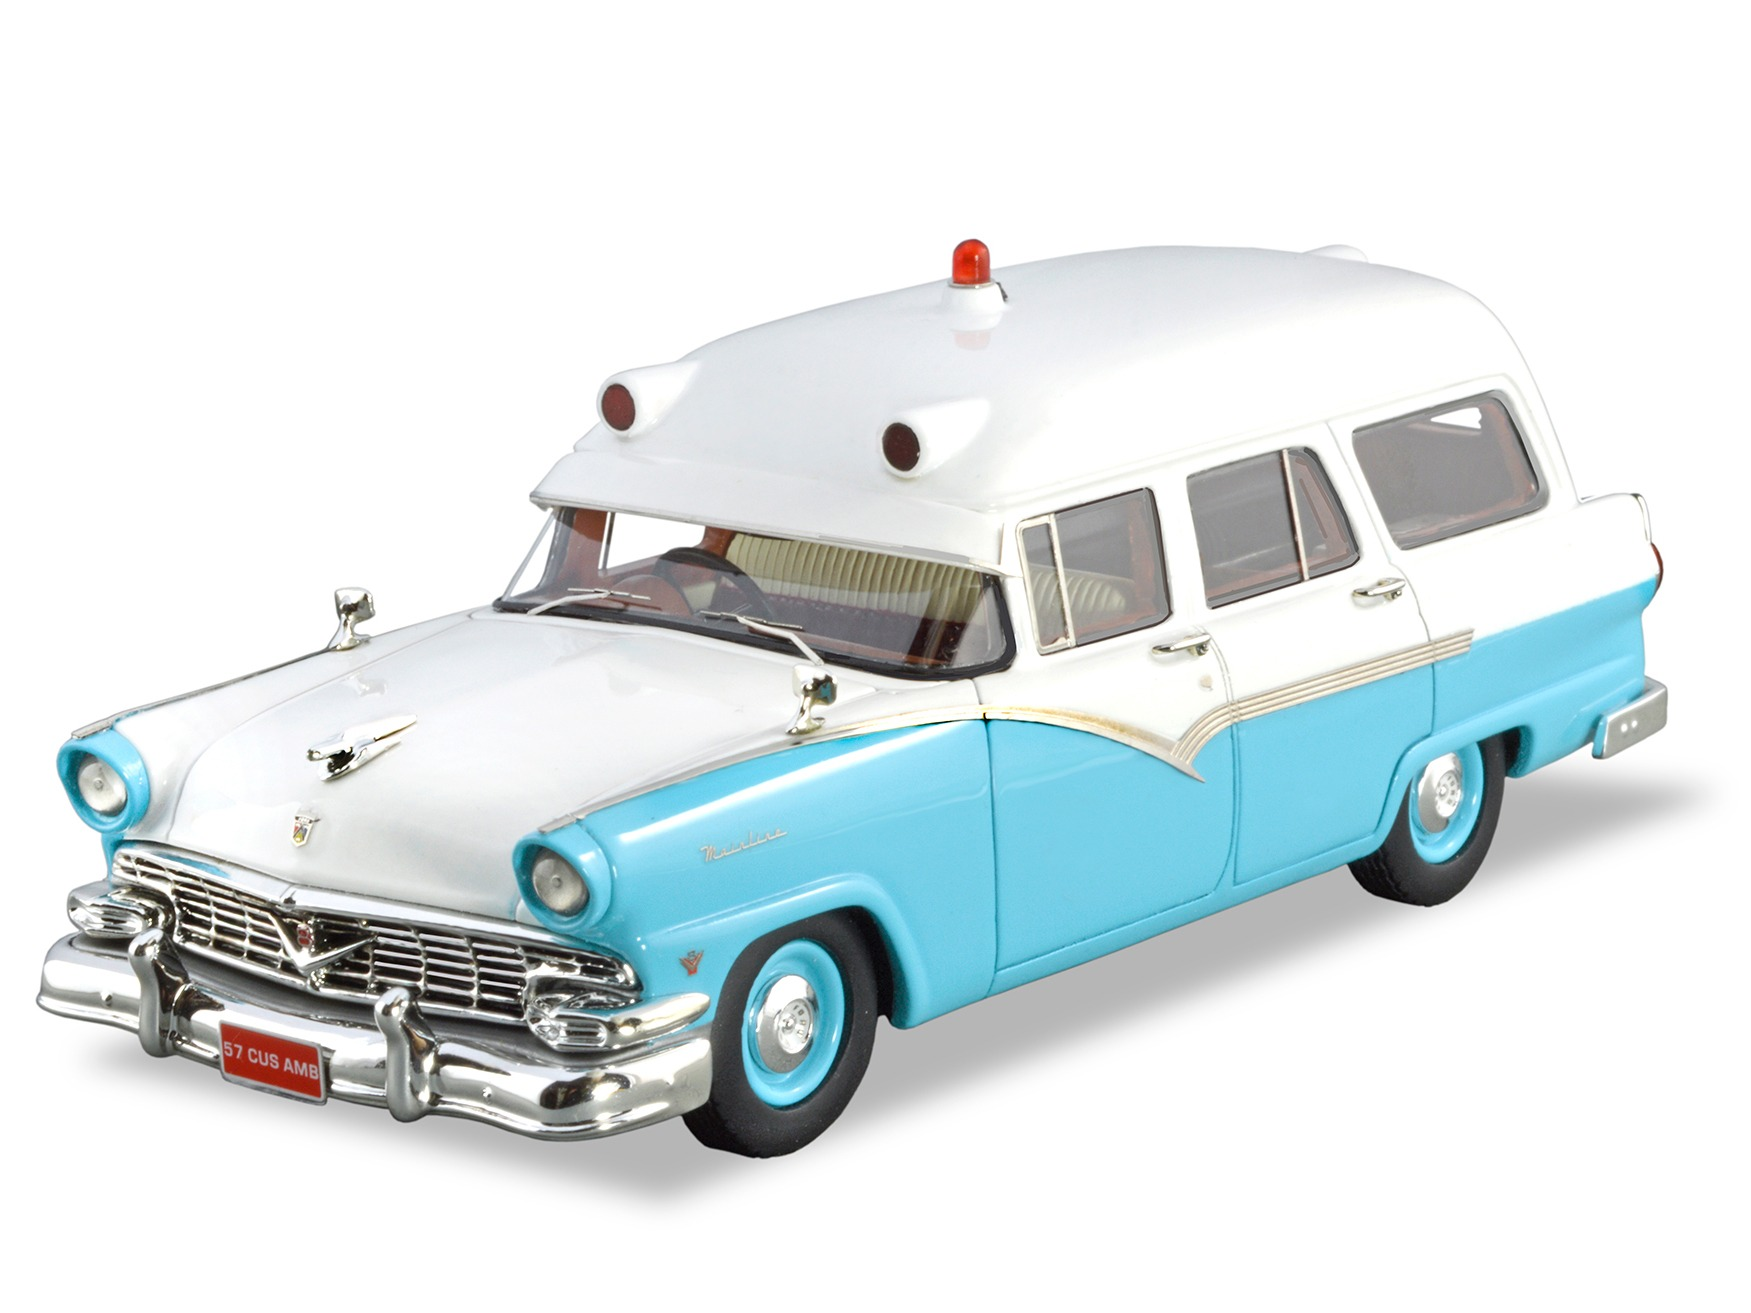 1957 Ford Mainline AMB – Blue + White